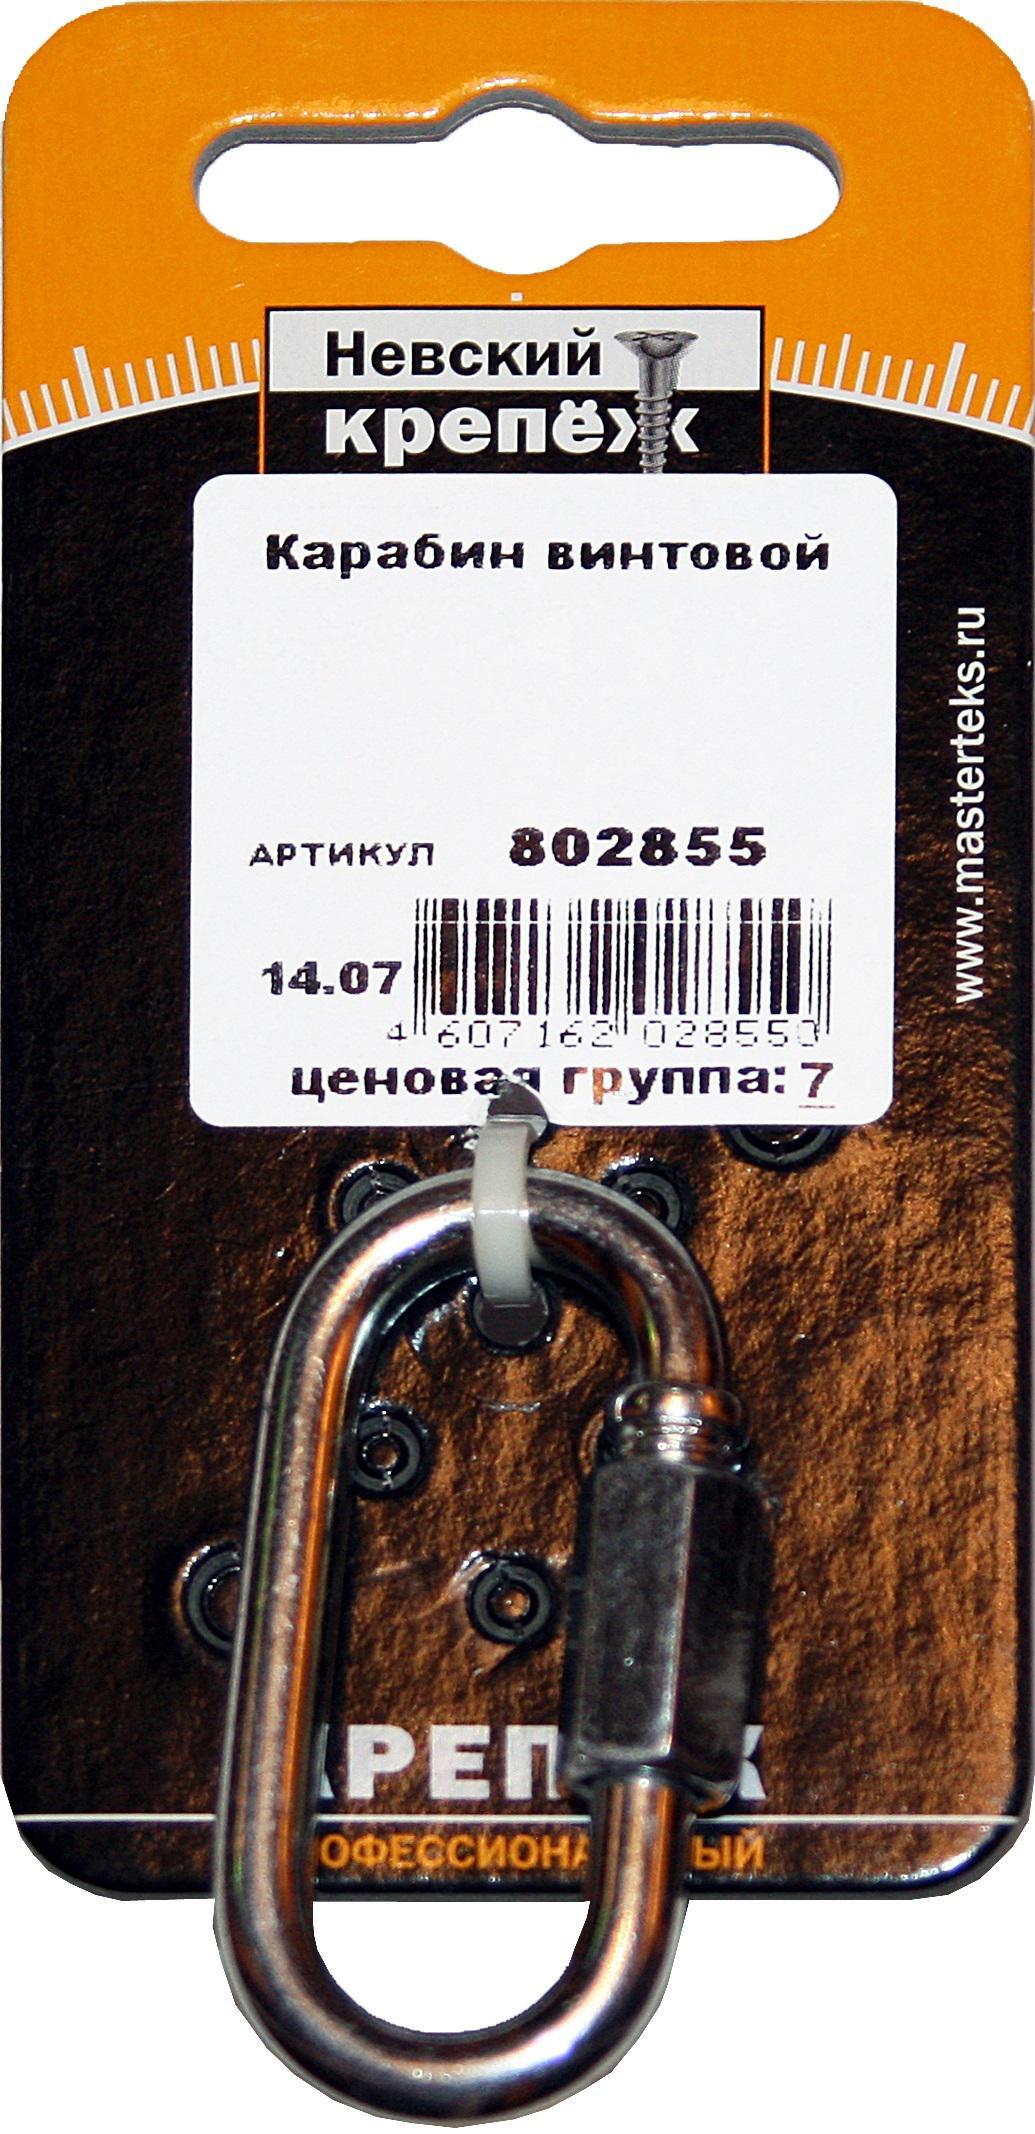 Карабин НЕВСКИЙ КРЕПЕЖ 802856